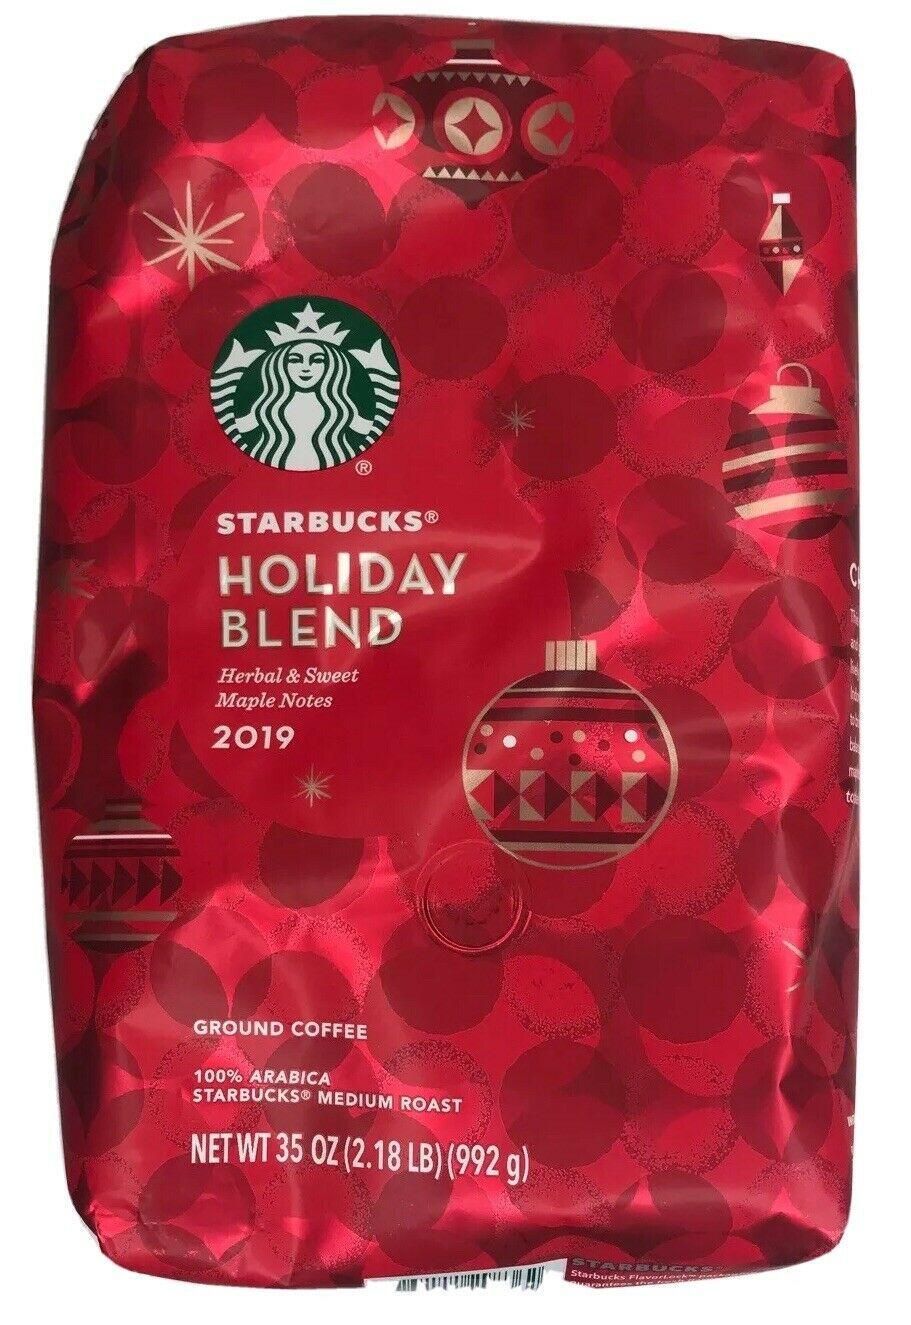 Starbucks Holiday Blend 2019 Ground Coffee Medium Roast Arabica 35 Oz 2 18 Lb Ideas Of Starbucks Coffe Starbucks Holiday Blend Holiday Coffee Holiday Blend